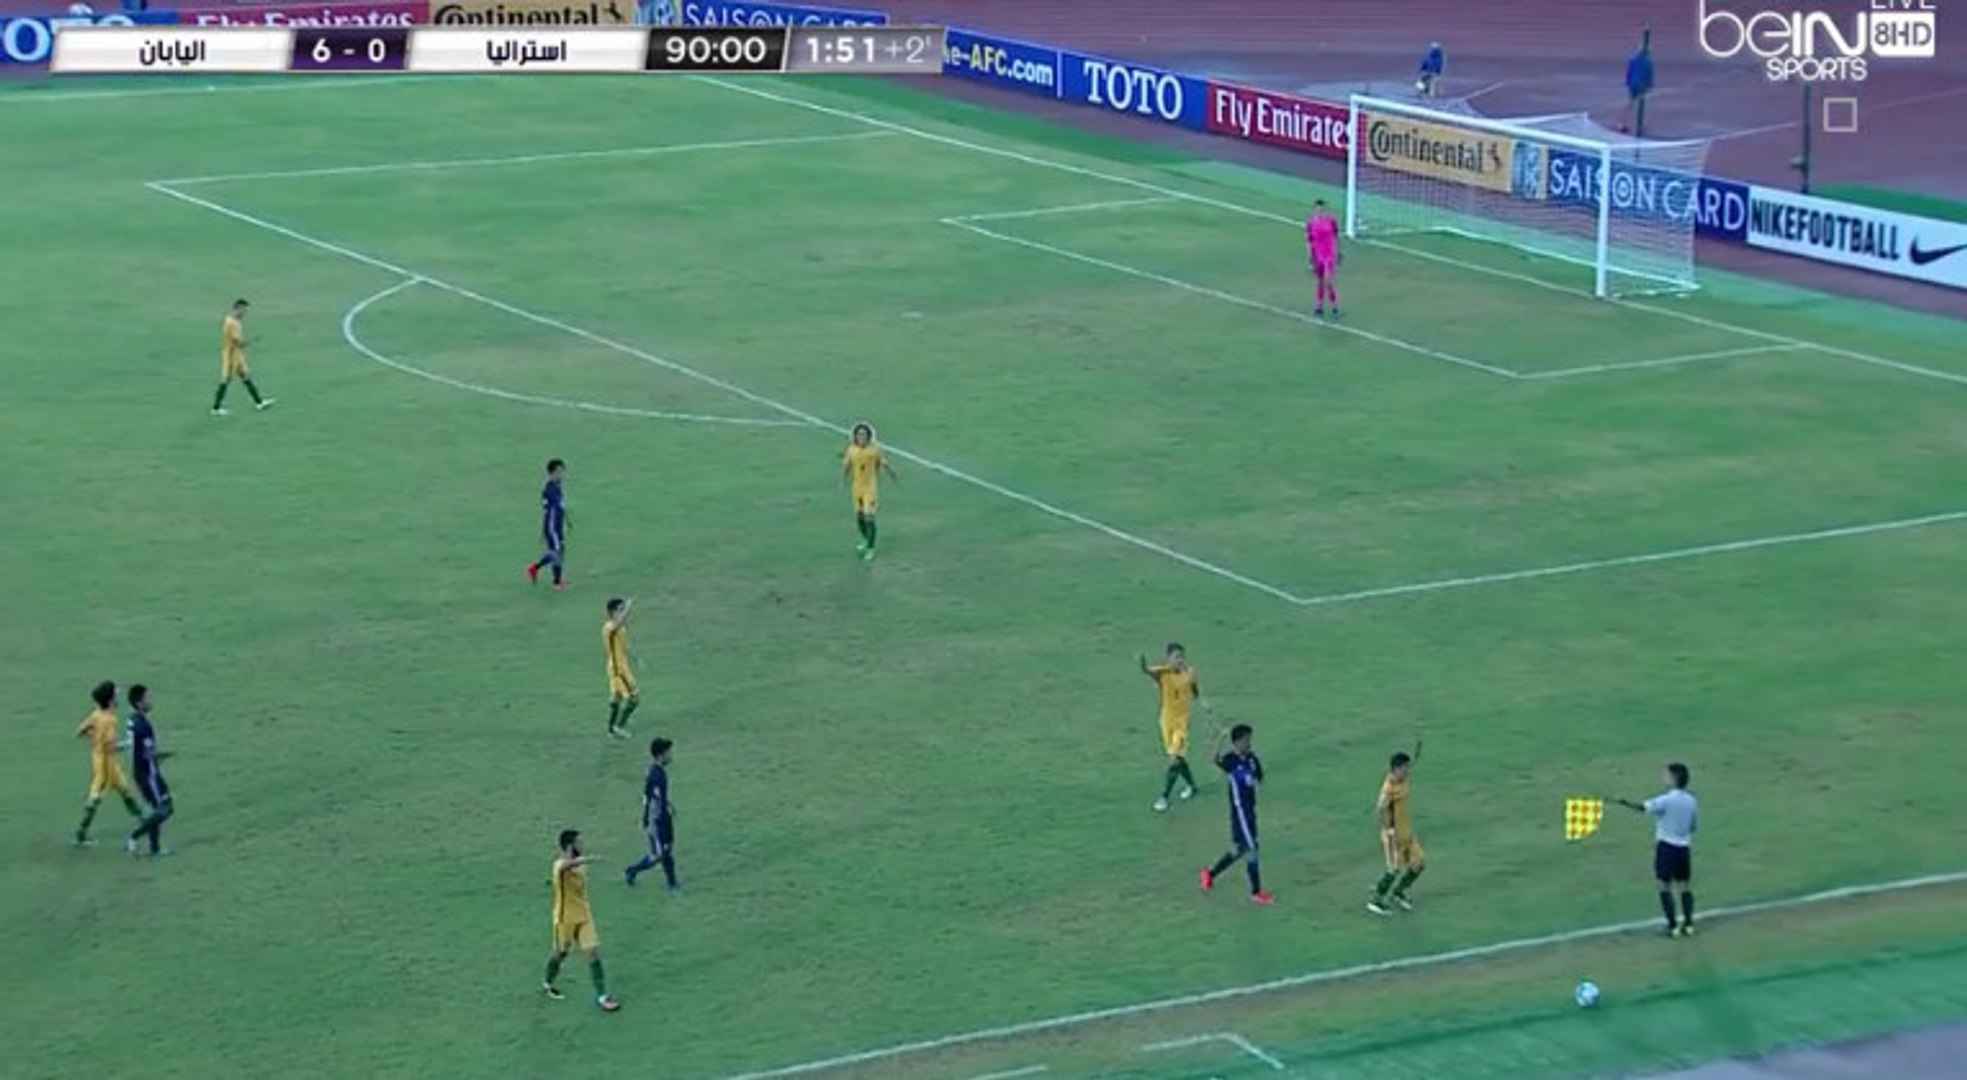 Australia 0-6 Japan - All Goals Exclusive (22/09/2016) / AFC U-16